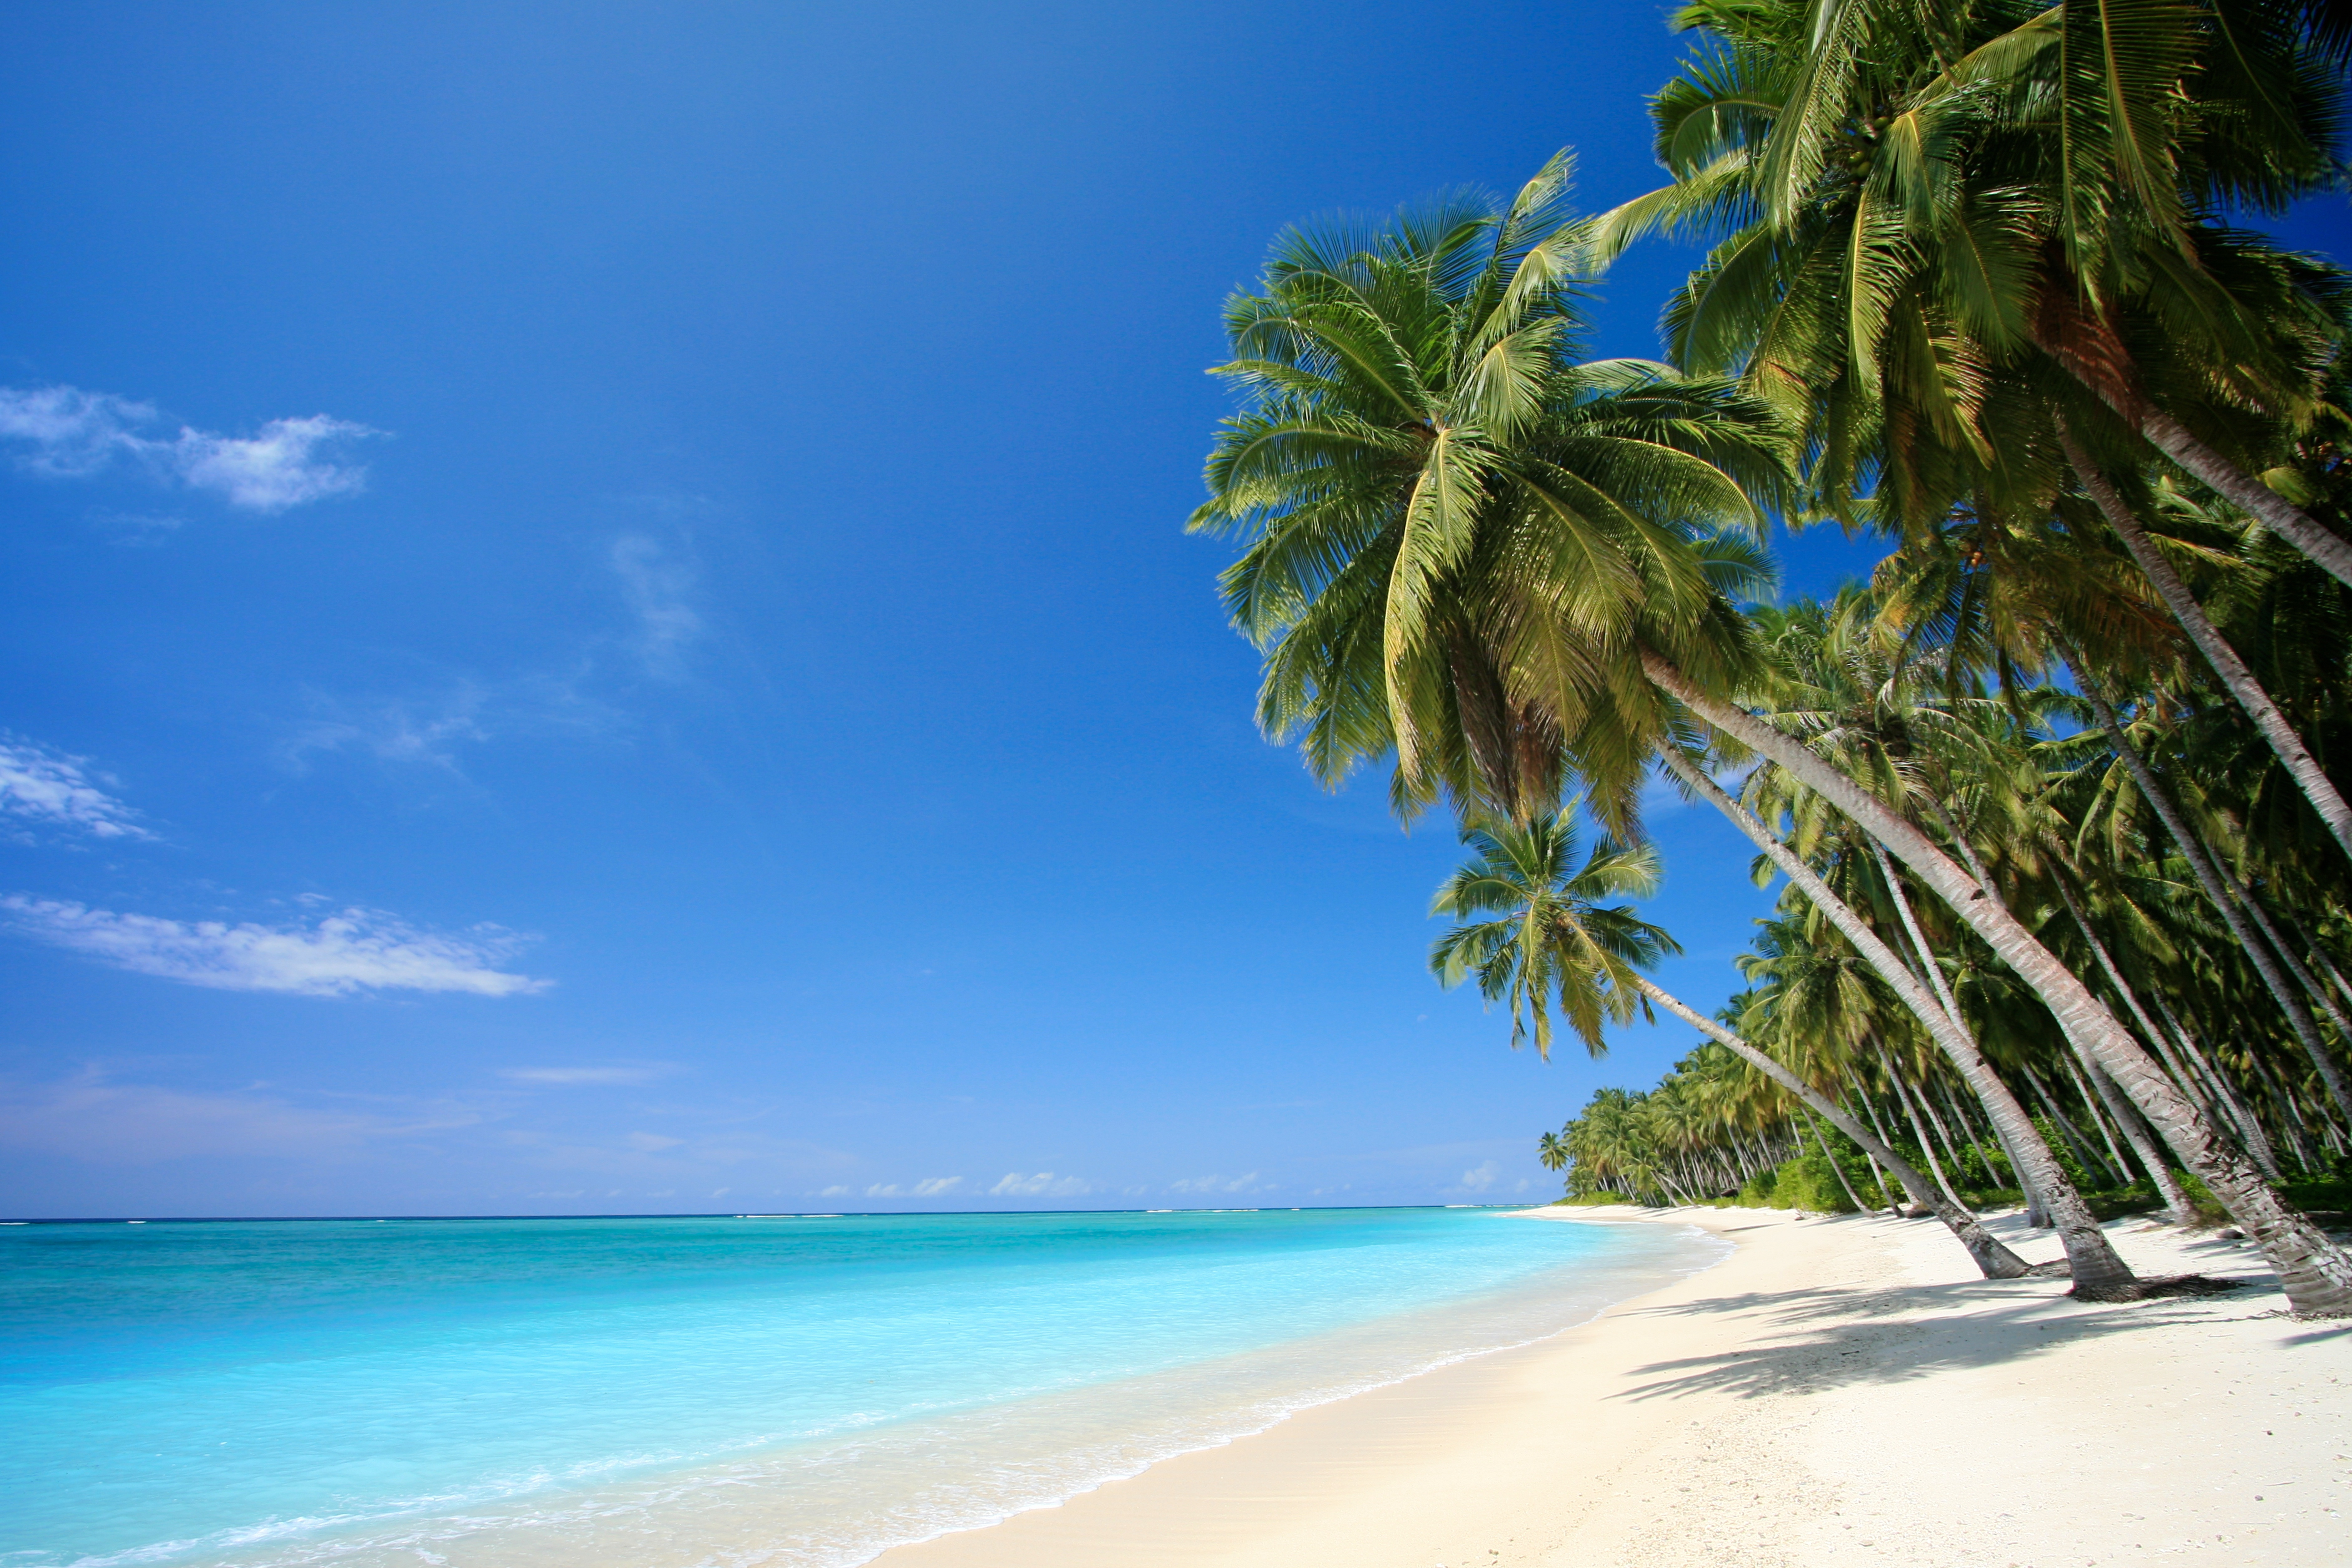 Hd Tropical Island Beach Paradise Wallpapers And Backgrounds: Tropical Screensavers And Wallpaper